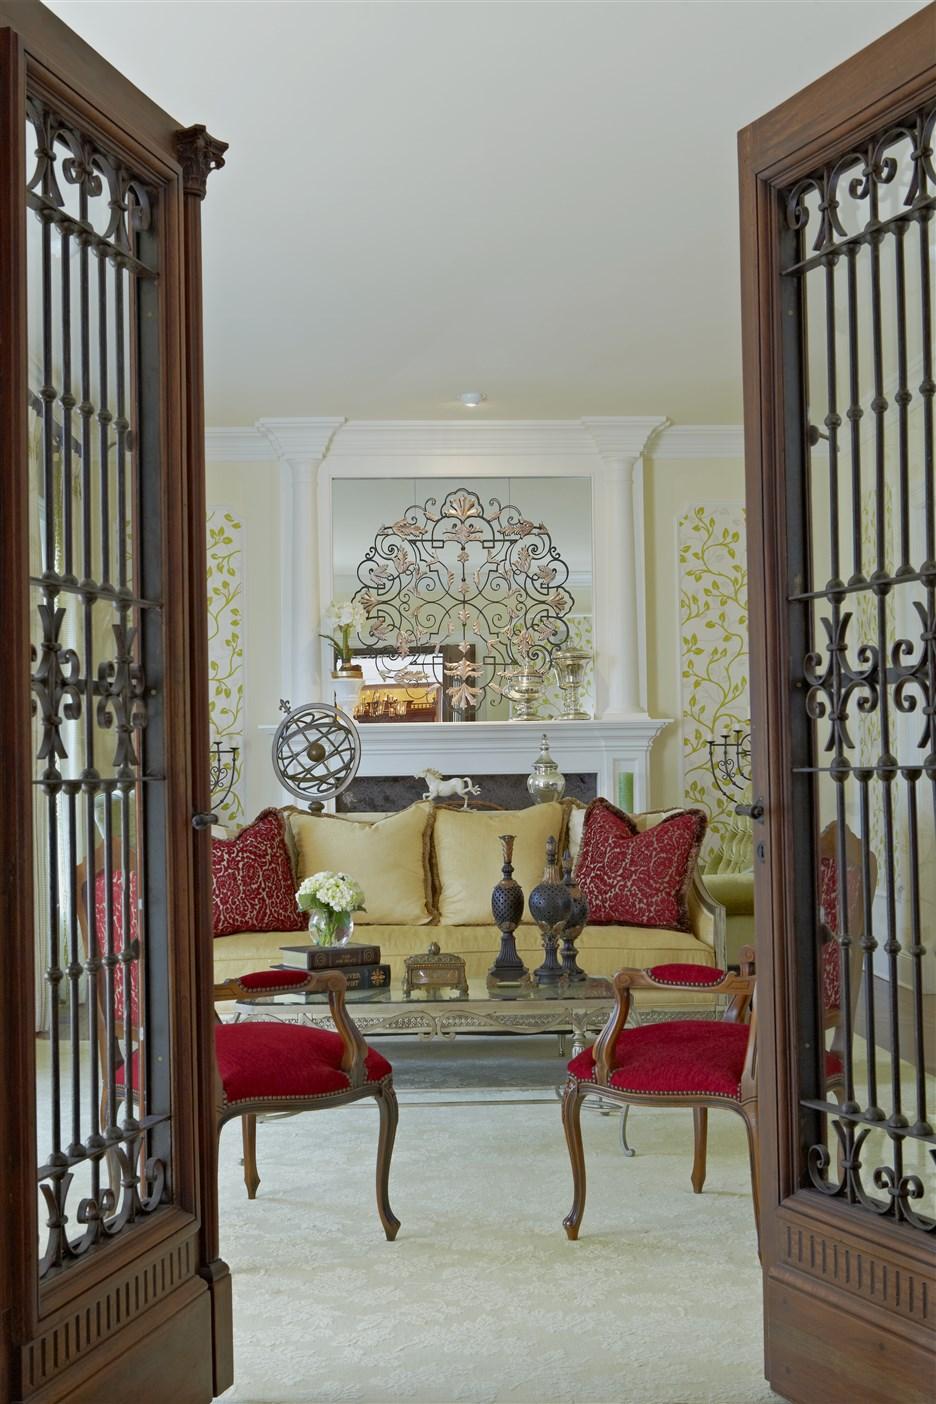 Living room entrance with open double door